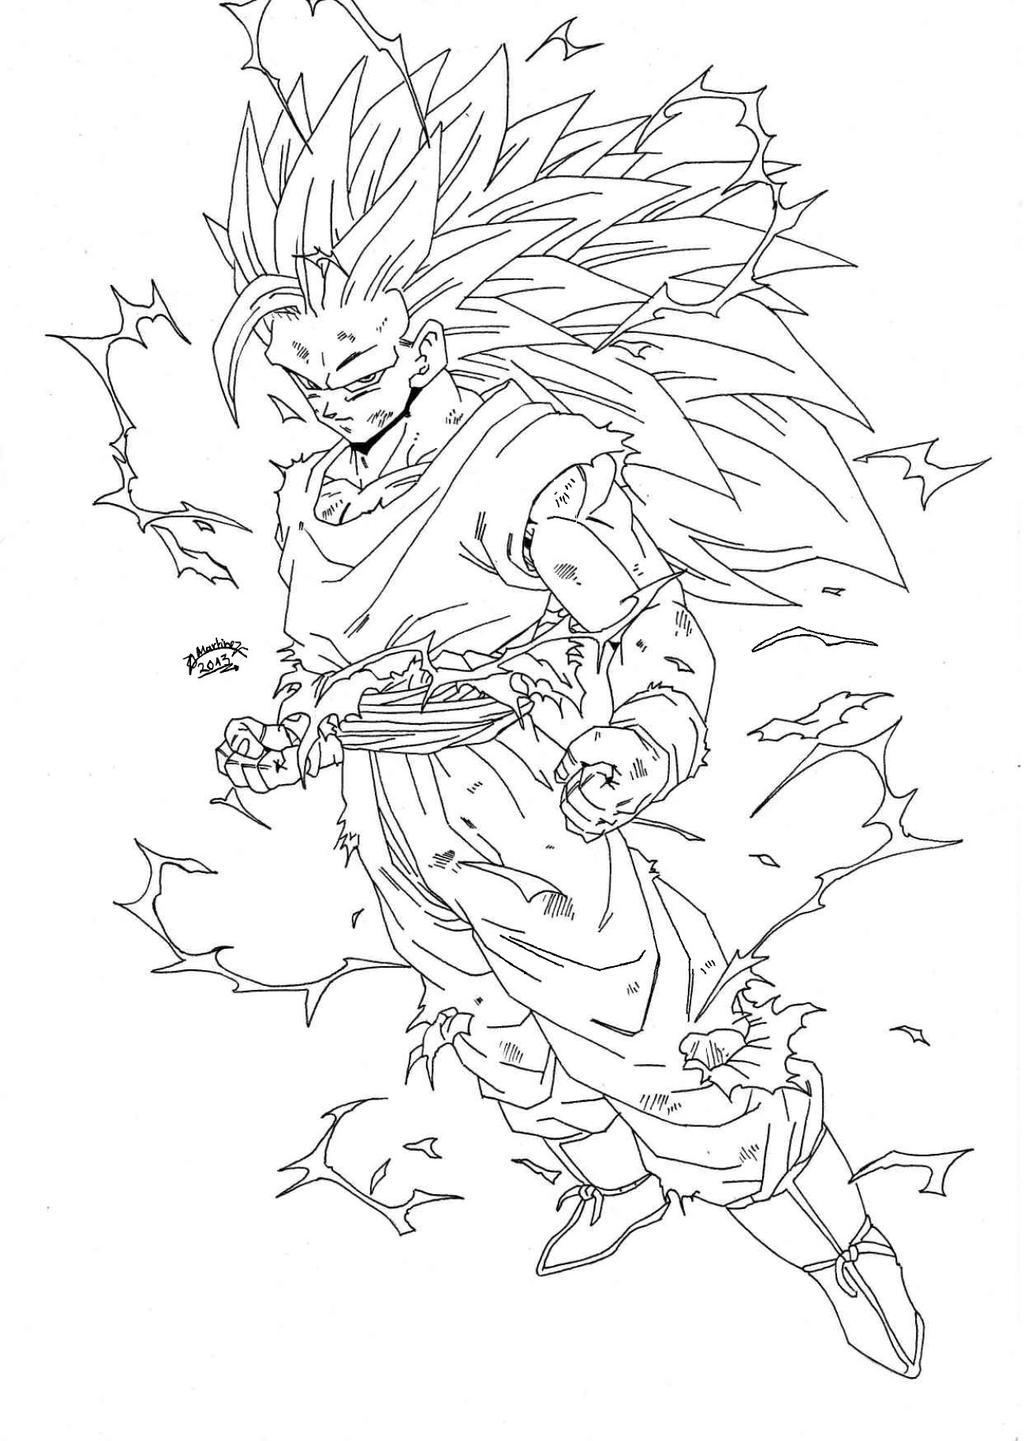 Dragon Ball Z Lineart : Dragonball z regreso goku super sayan lineart by